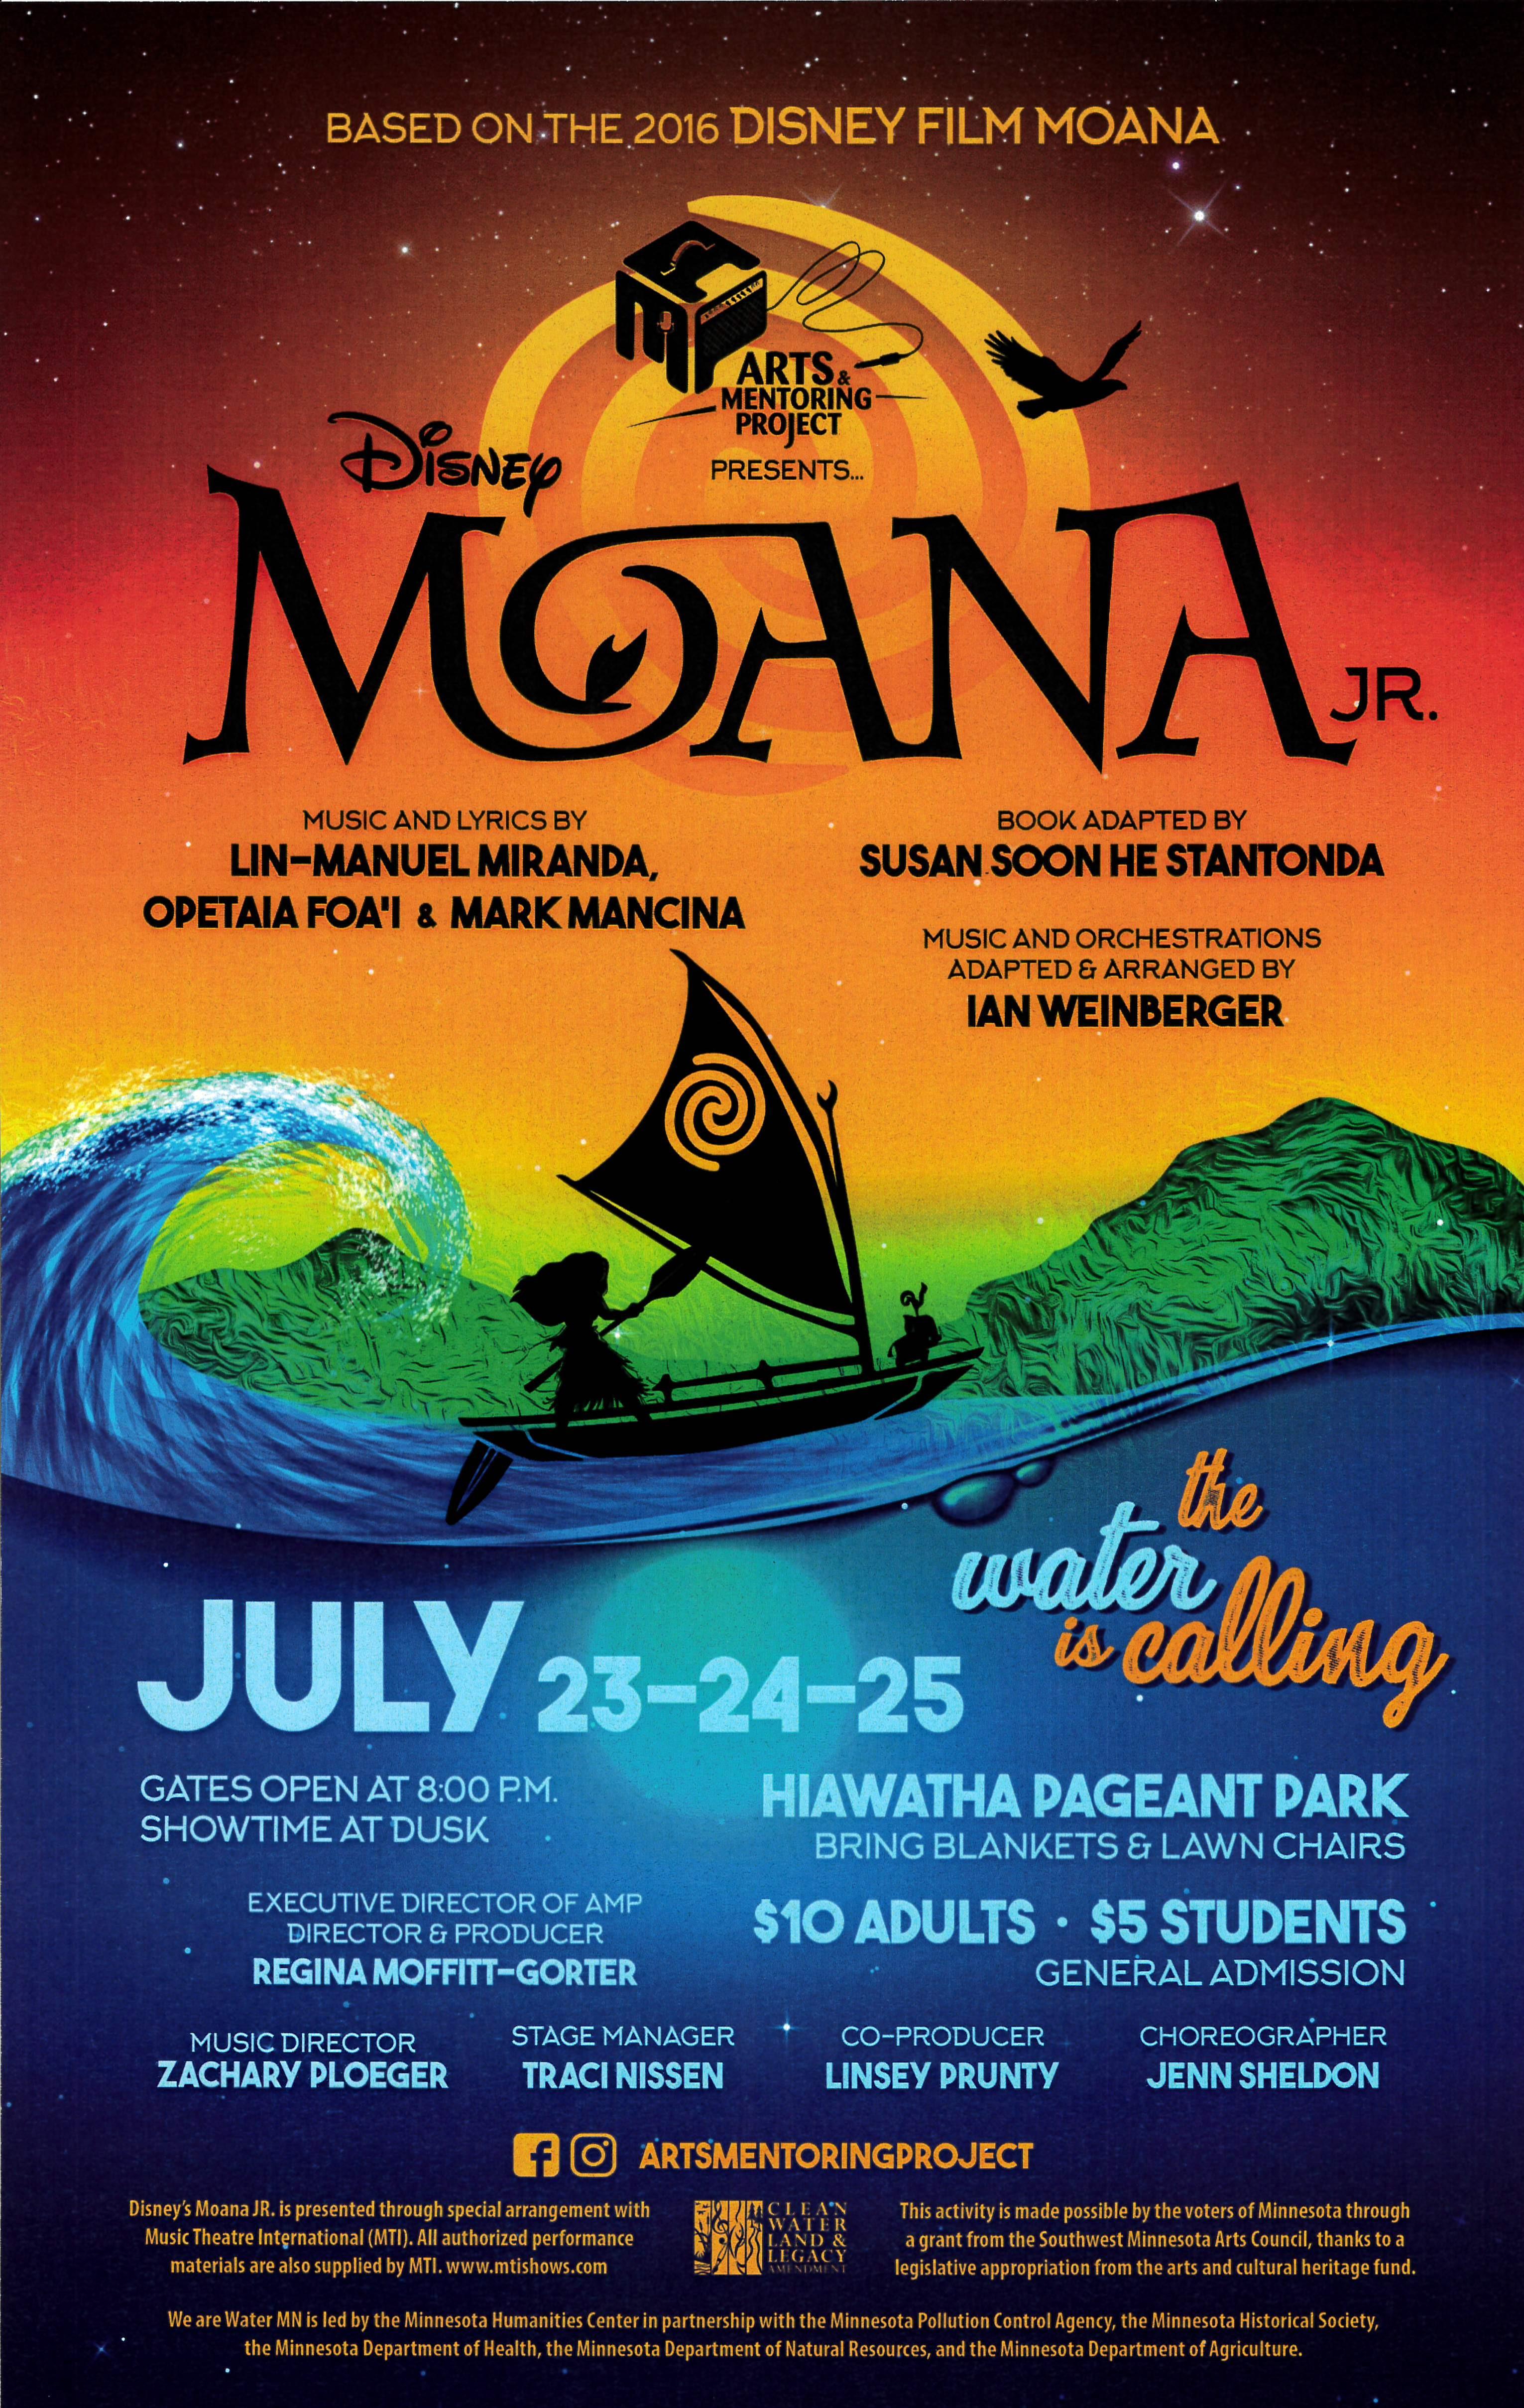 Moana Jr. Poster